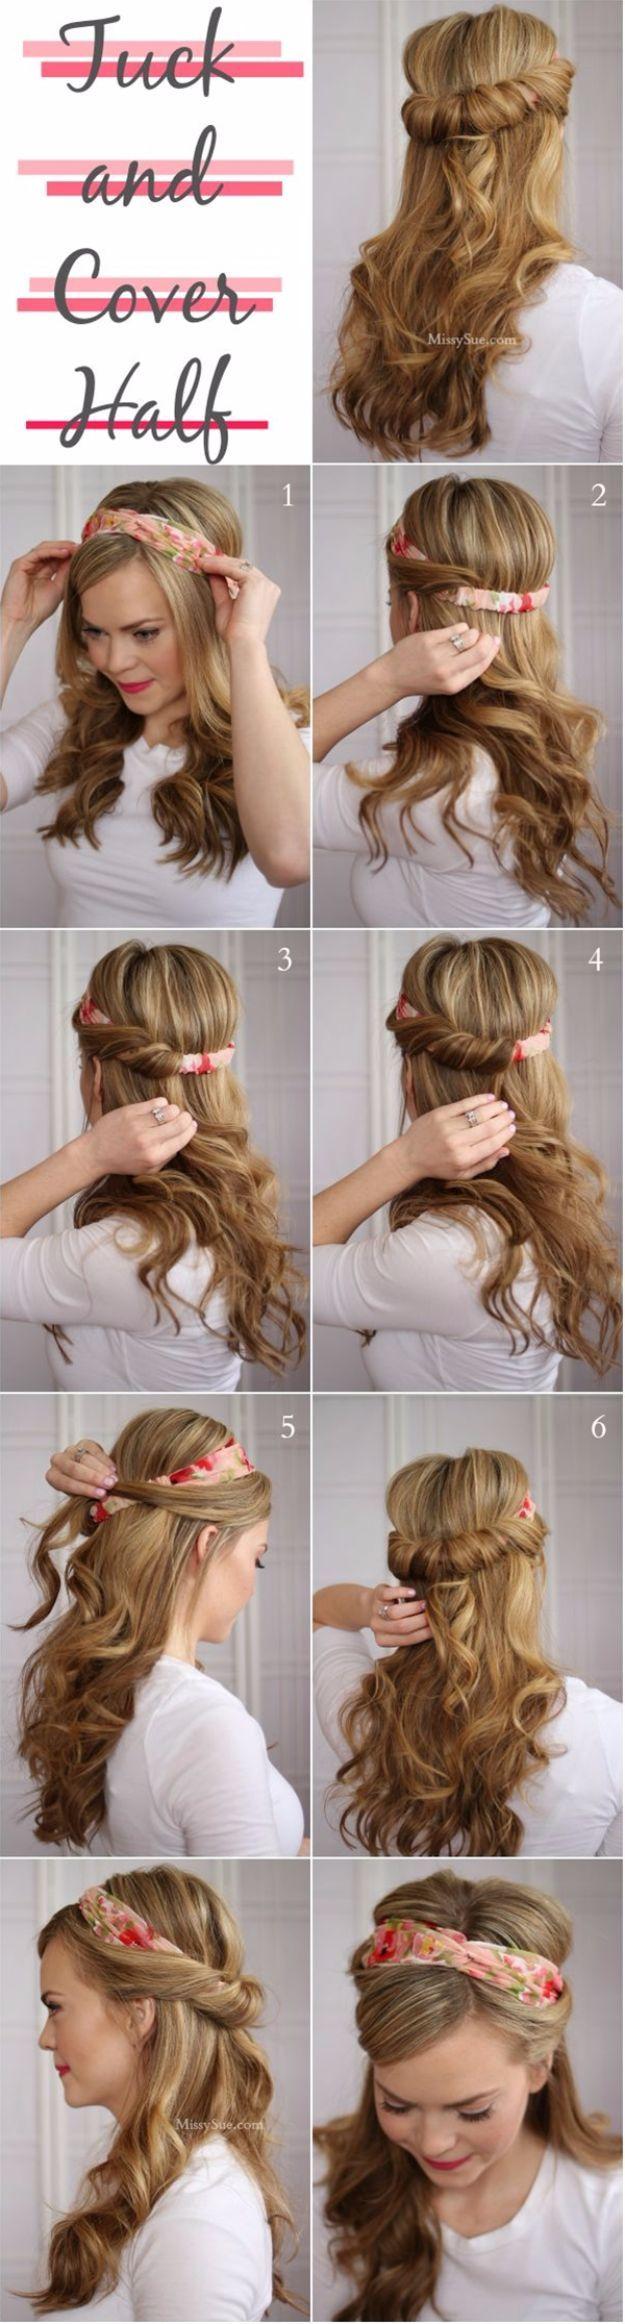 cool hair tutorials for summer braids pinterest ponytail